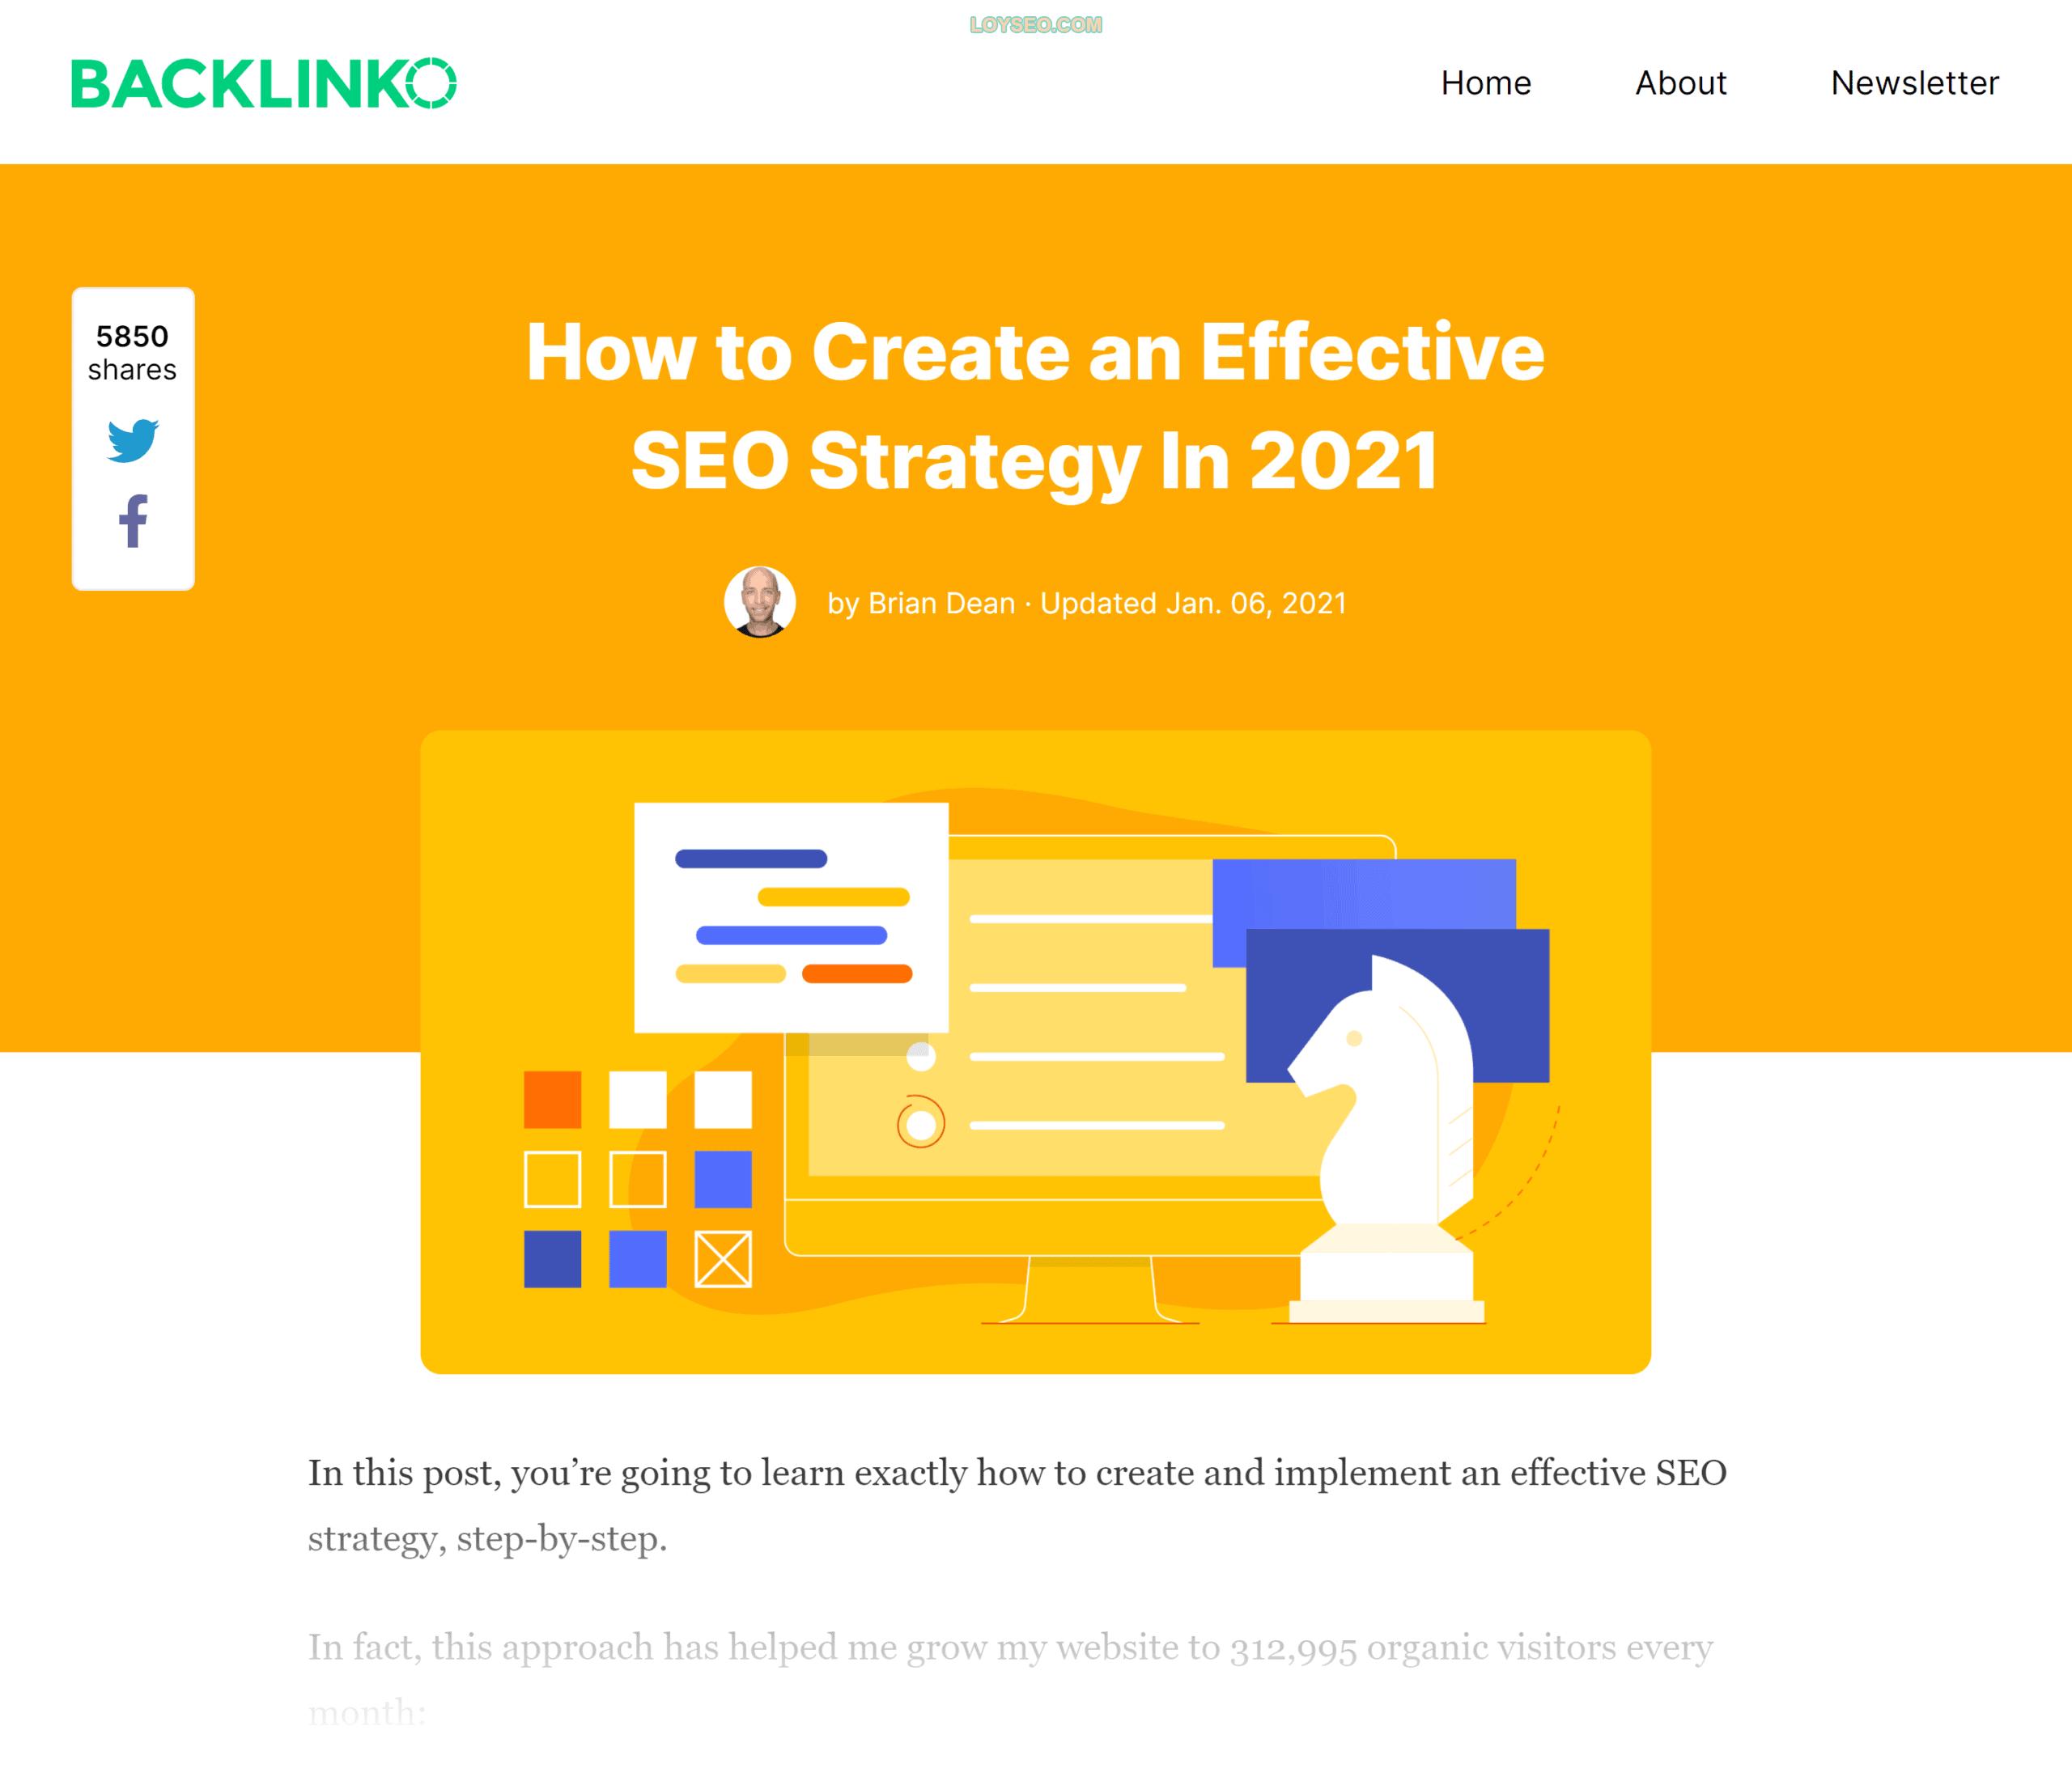 Backlinko – SEO strategy